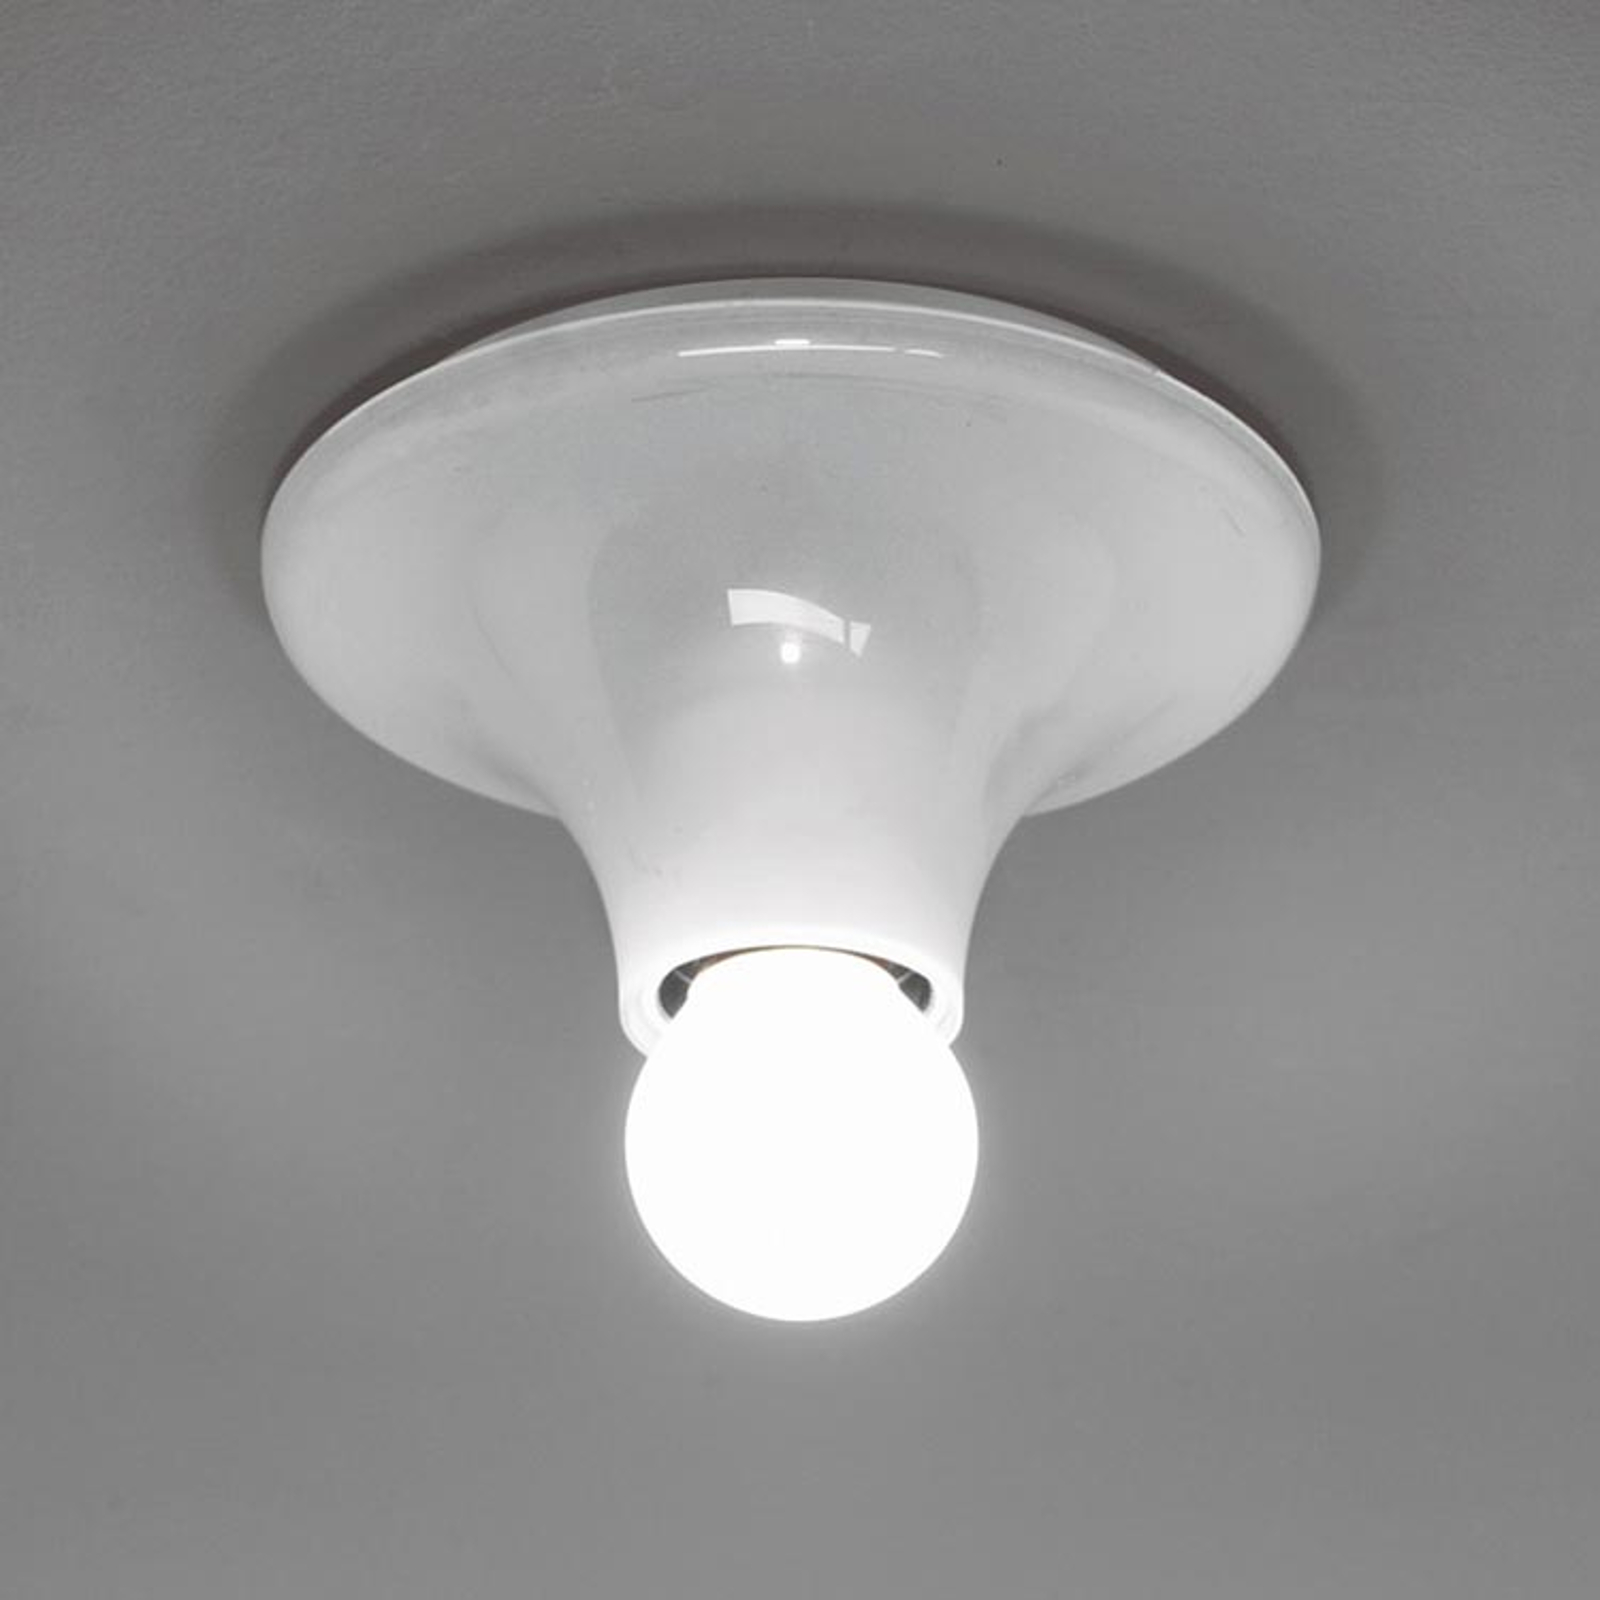 Design wandlamp Teti, wit